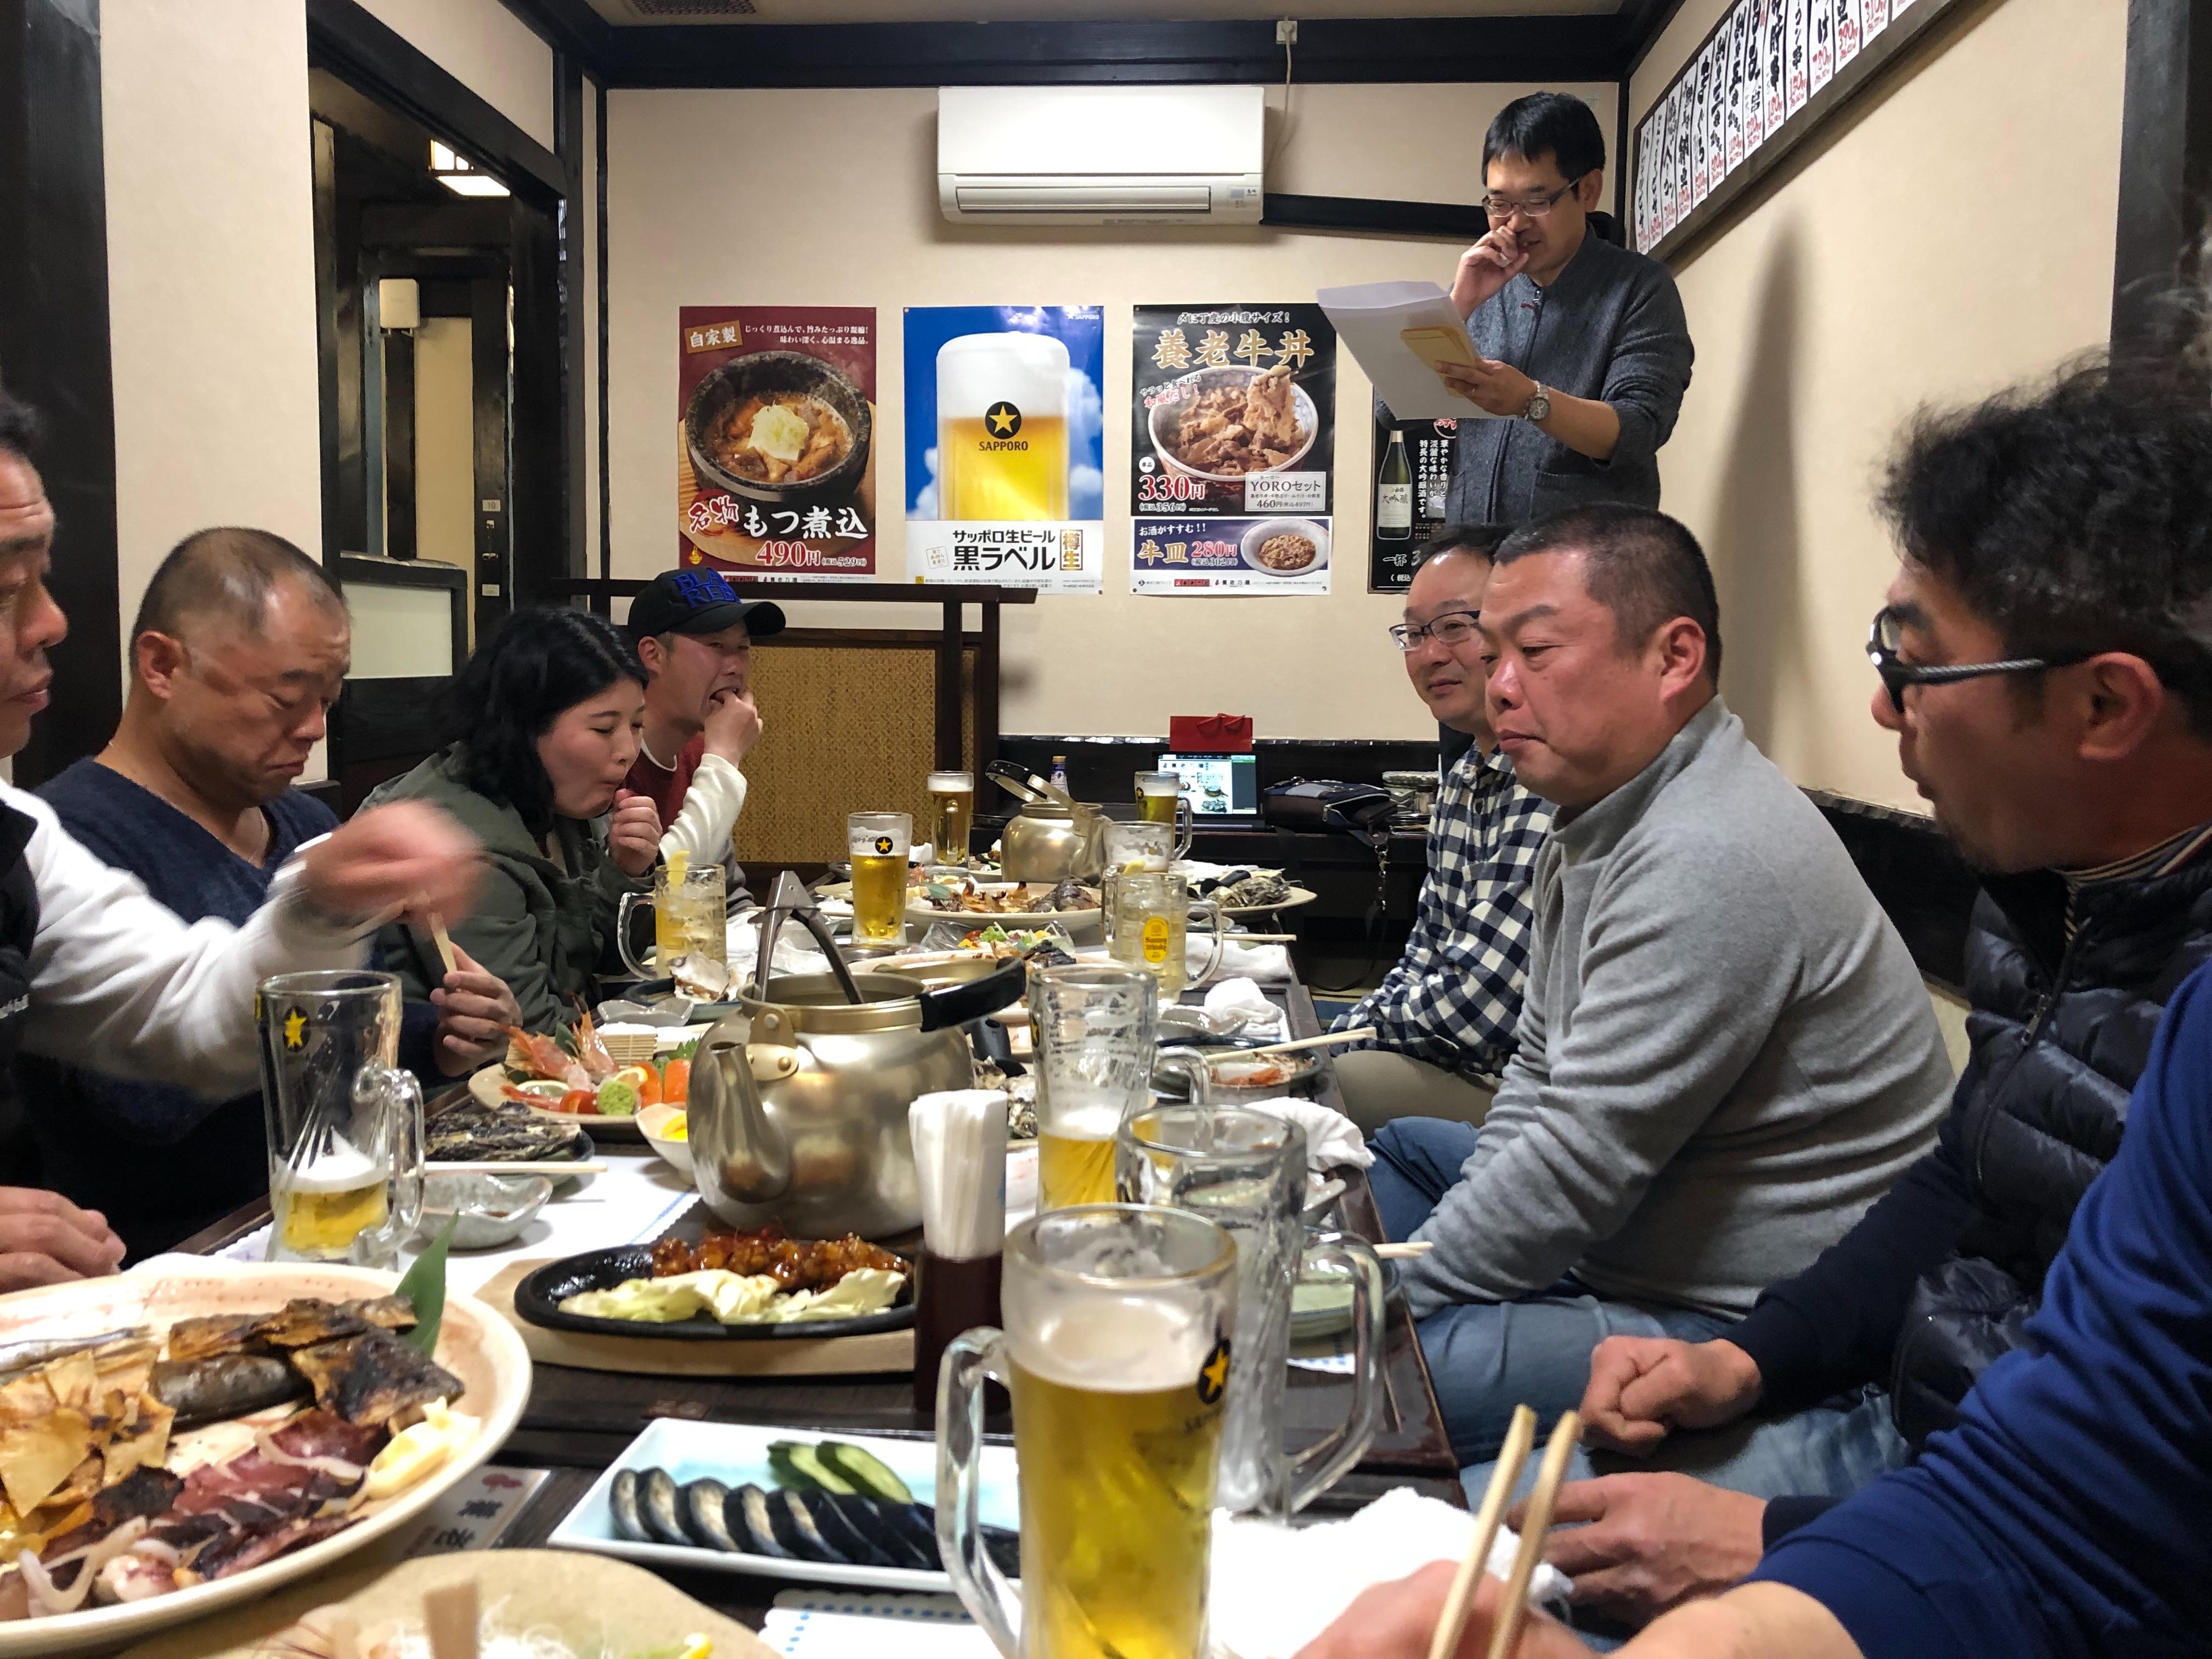 f:id:masanori-kato1972:20190325114112j:image